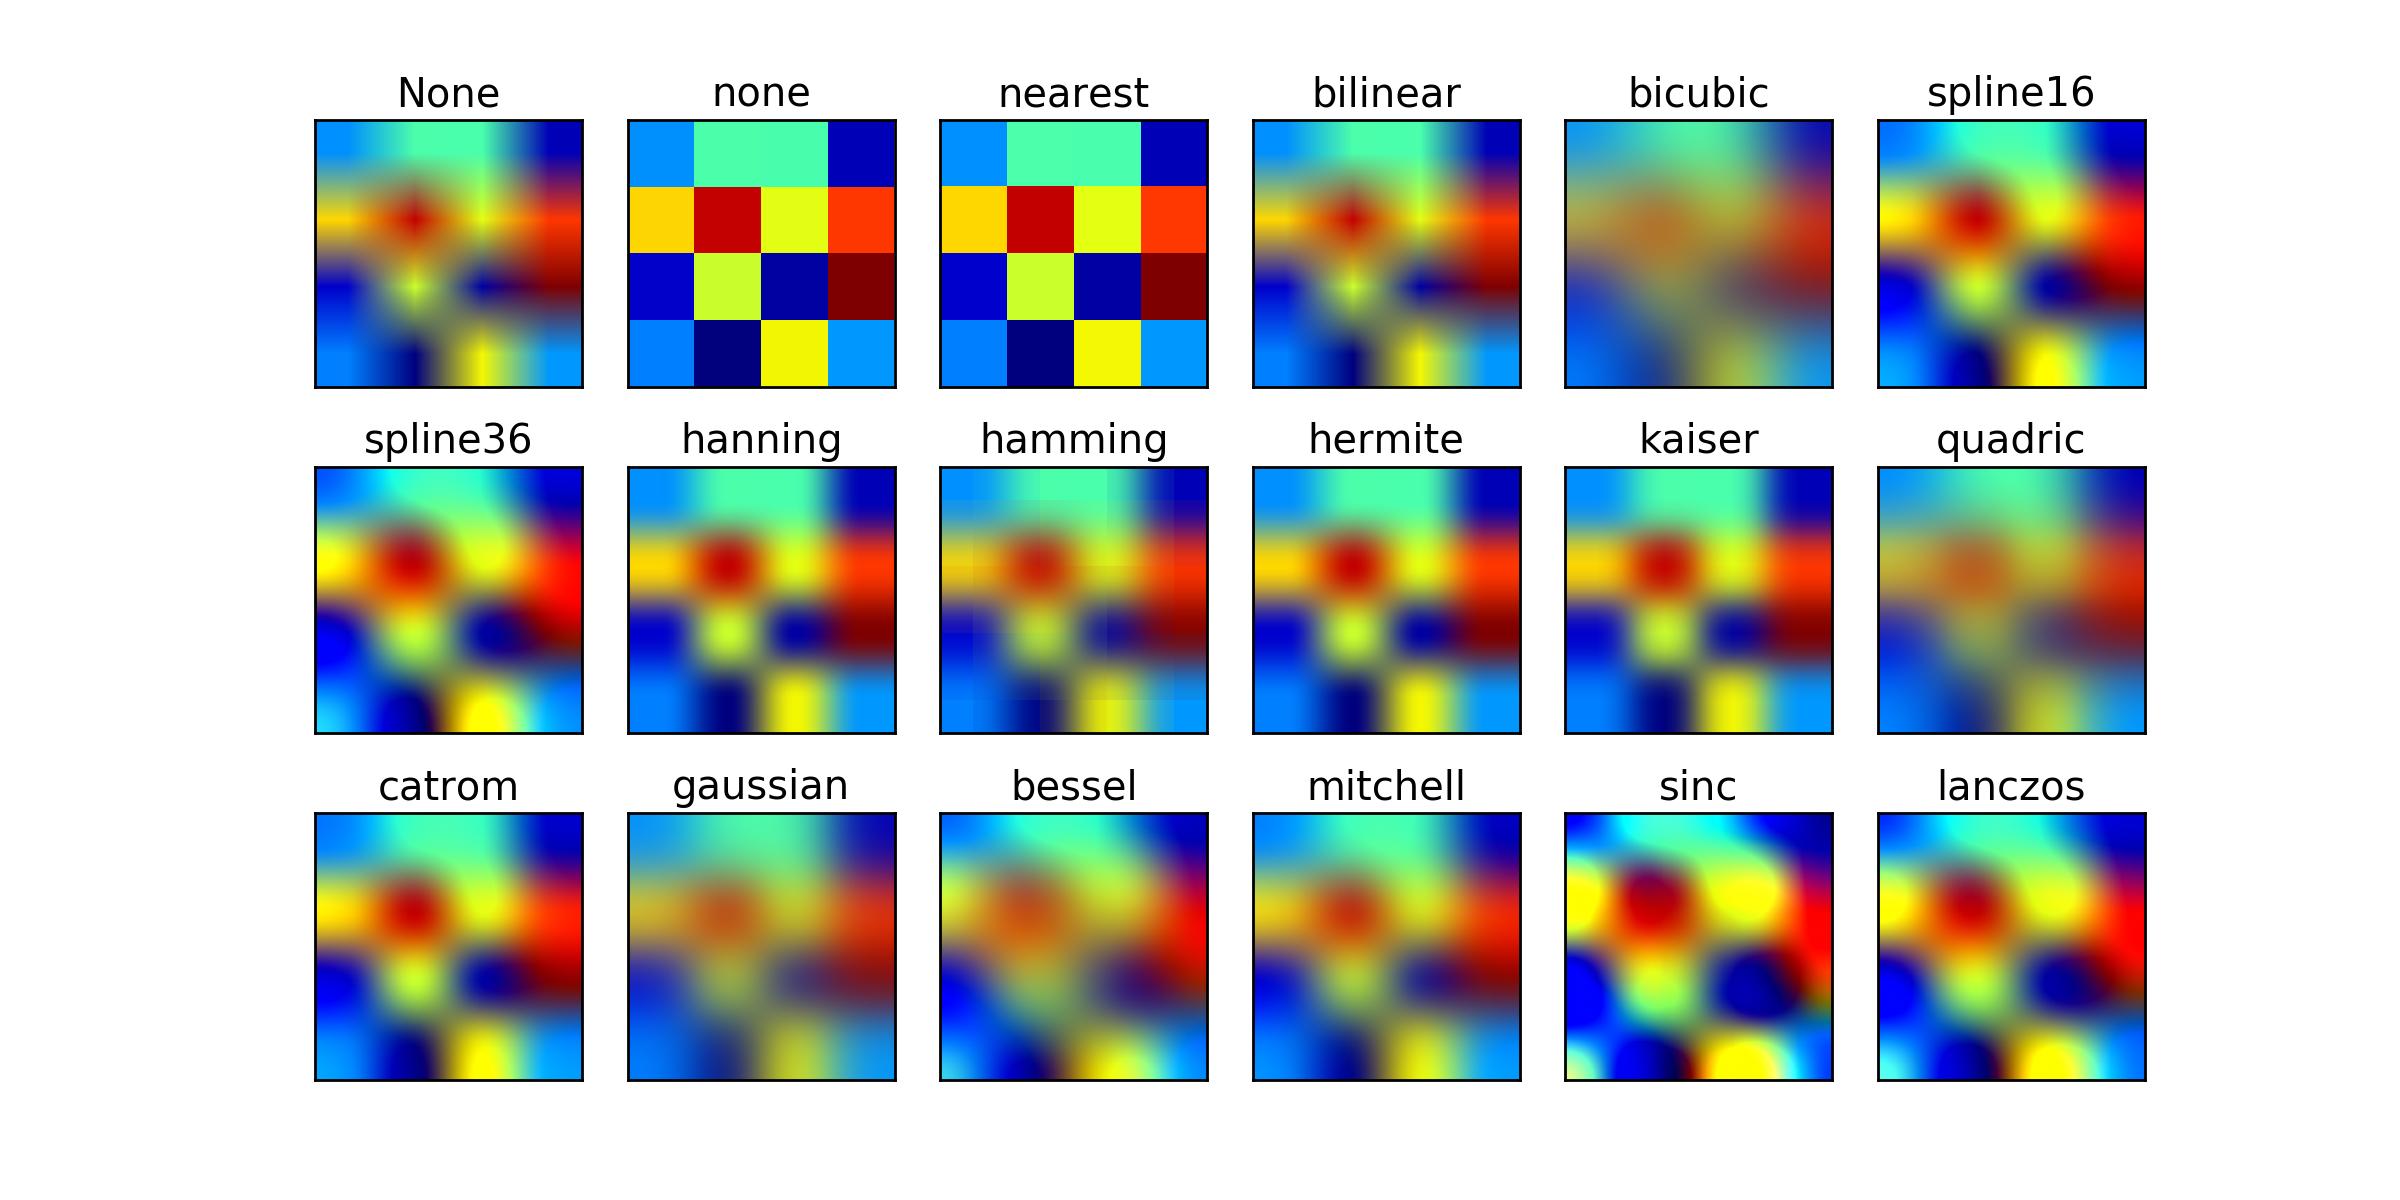 images_contours_and_fields example code: interpolation_methods.py —  Matplotlib 1.5.1 documentation